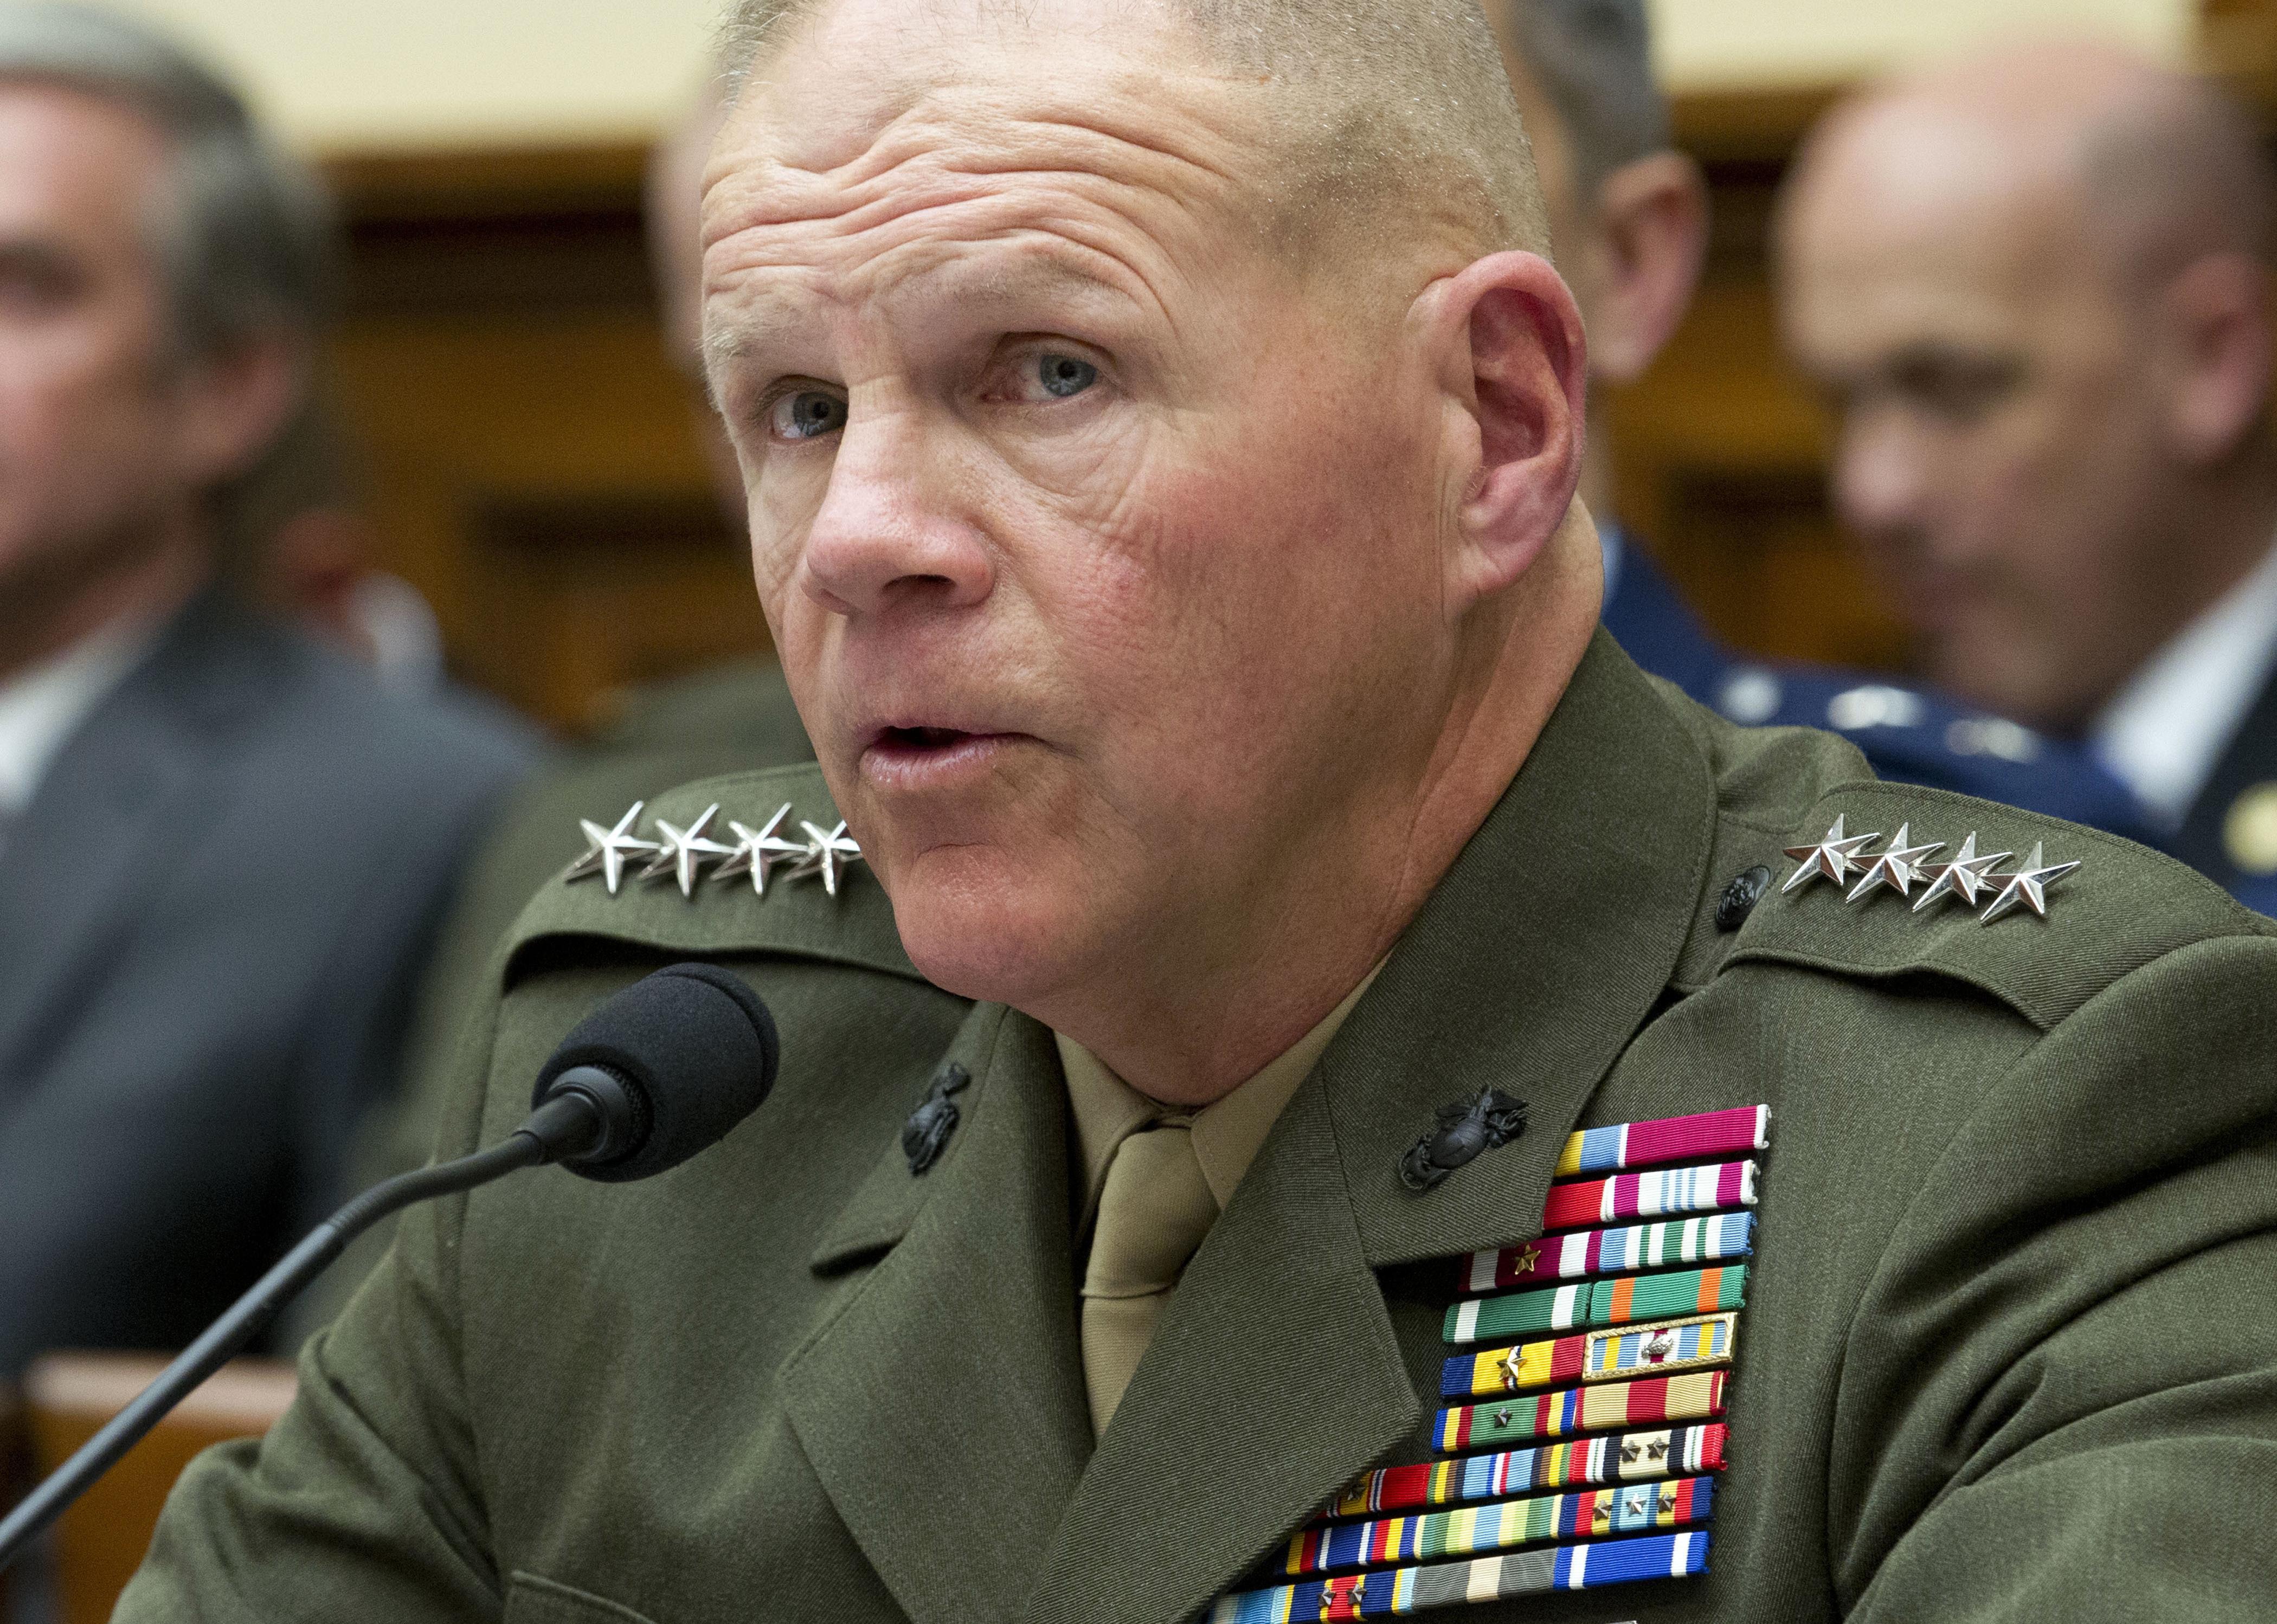 Top Marine says Trump's border focus hurting military's combat readiness